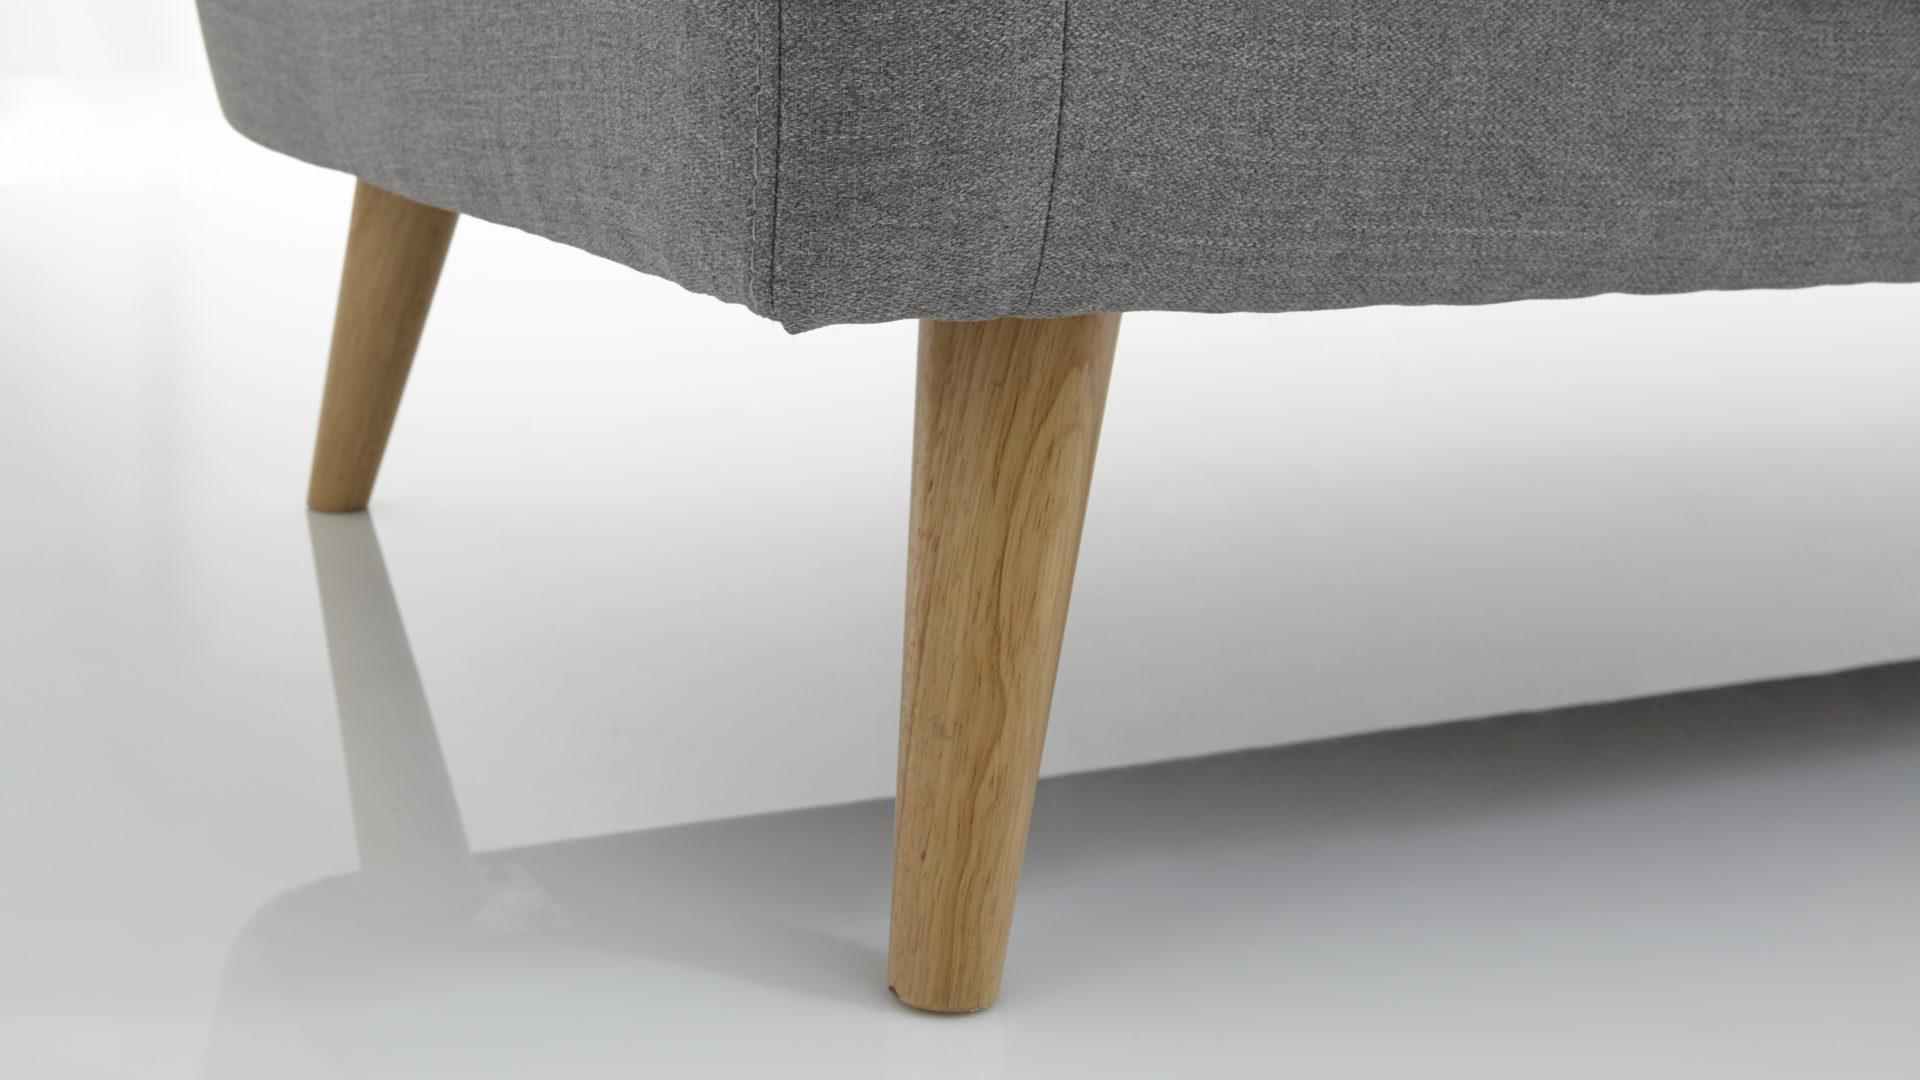 Möbel Frauendorfer Amberg, 3-Sitzer, 3-Sitzer Sofa im Retro-Stil ...